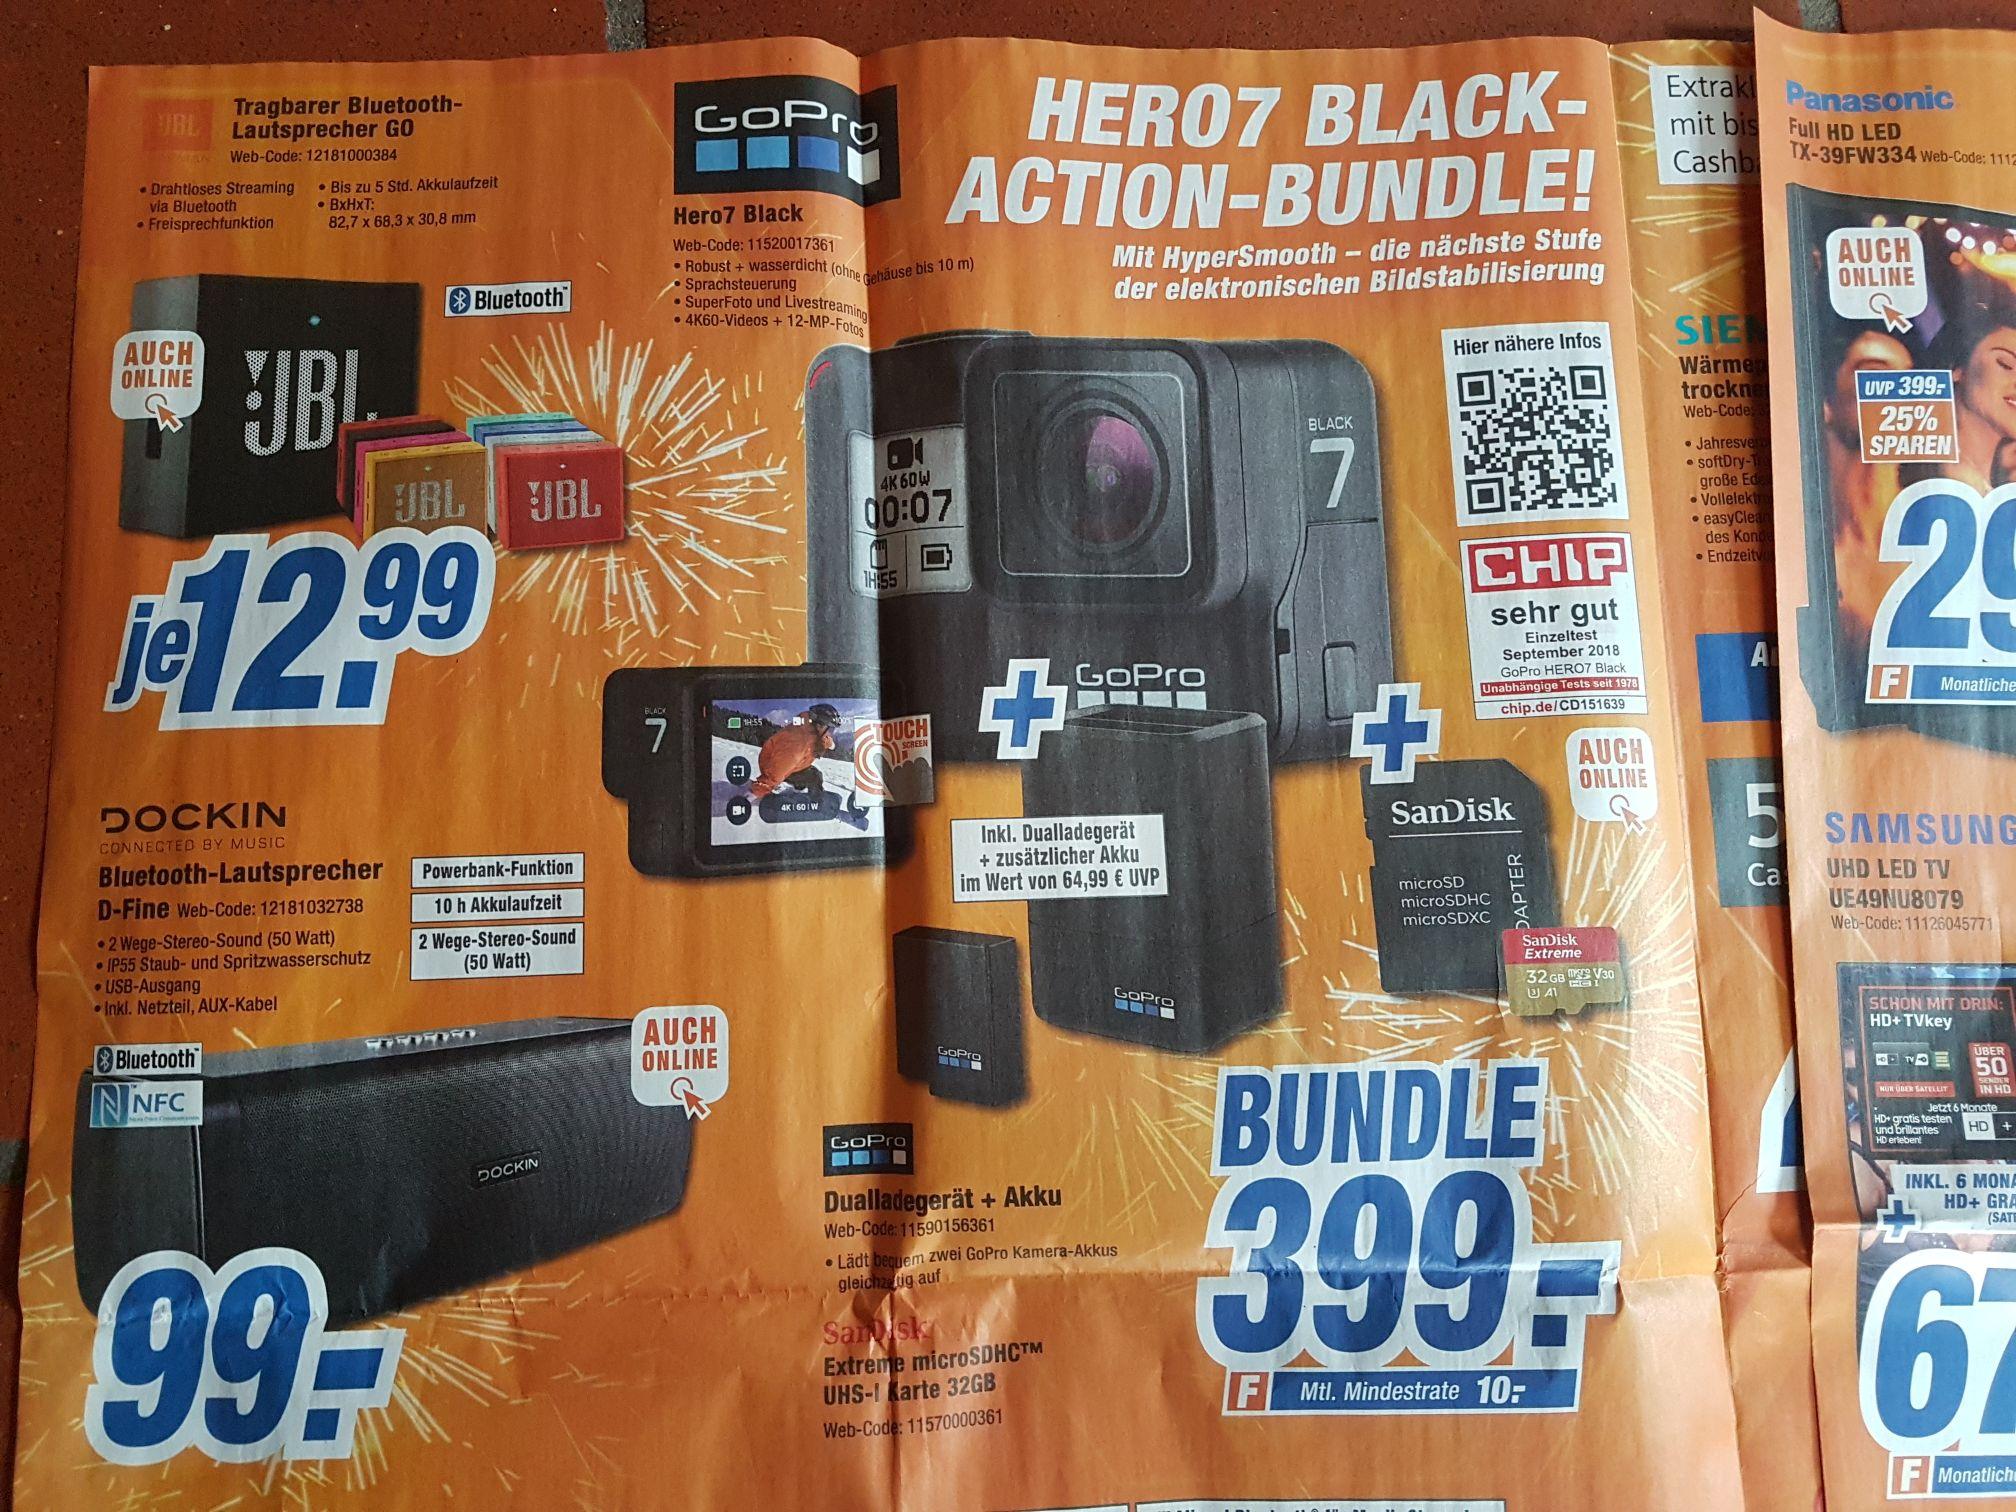 [Expert online + Ellwangen] GoPro Hero 7 Black + 2.Akku, dualladestation+32GB SDkarte